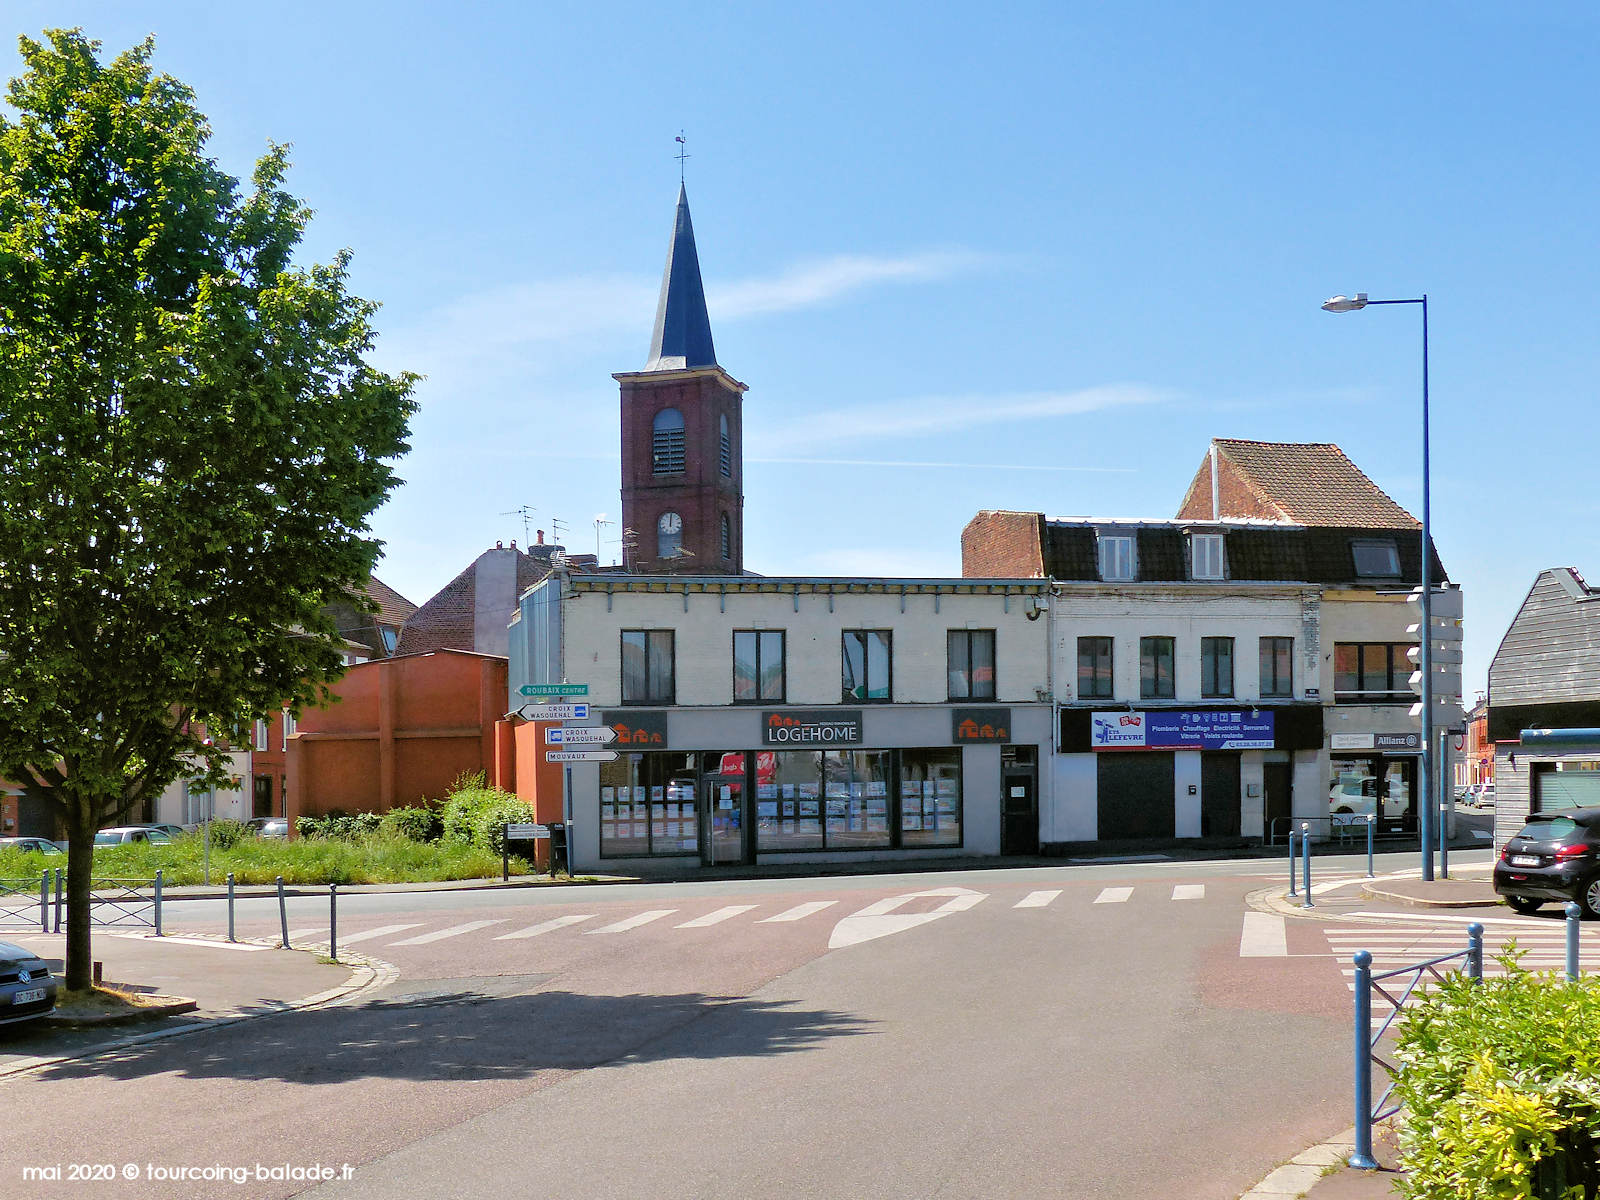 Boulevard Constantin Descat, Tourcoing, 2020